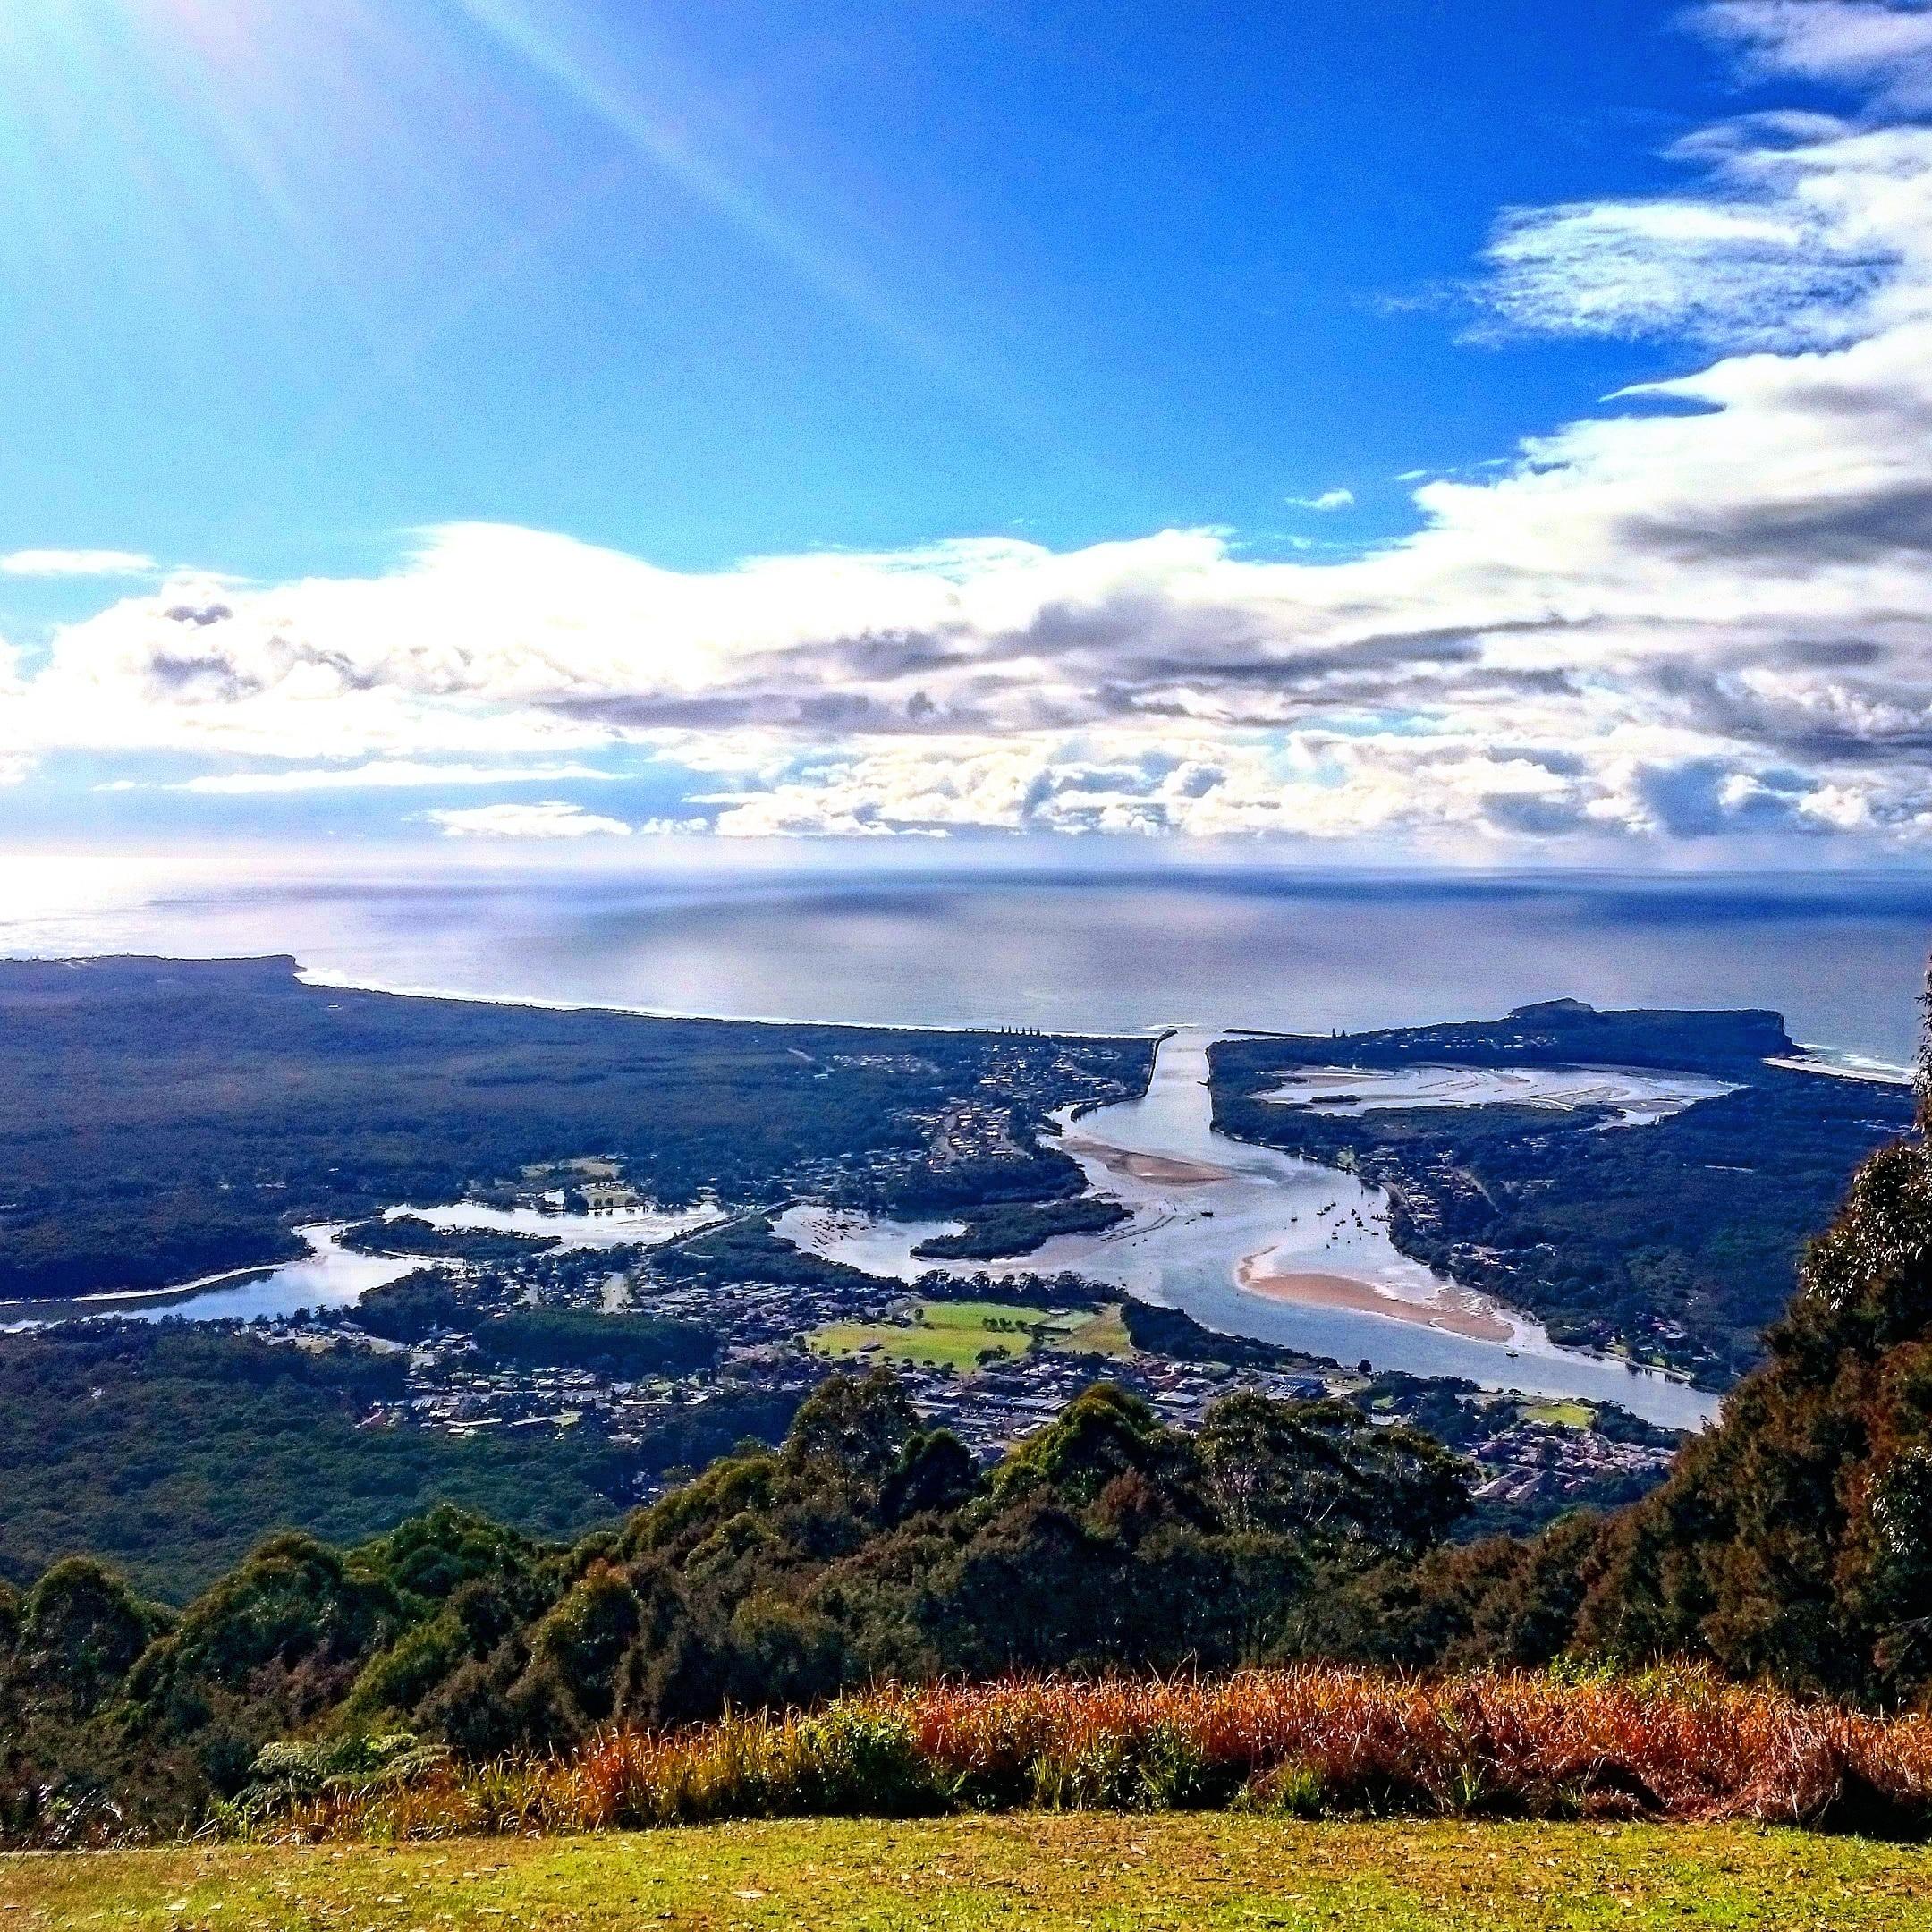 Laurieton, New South Wales, Australia